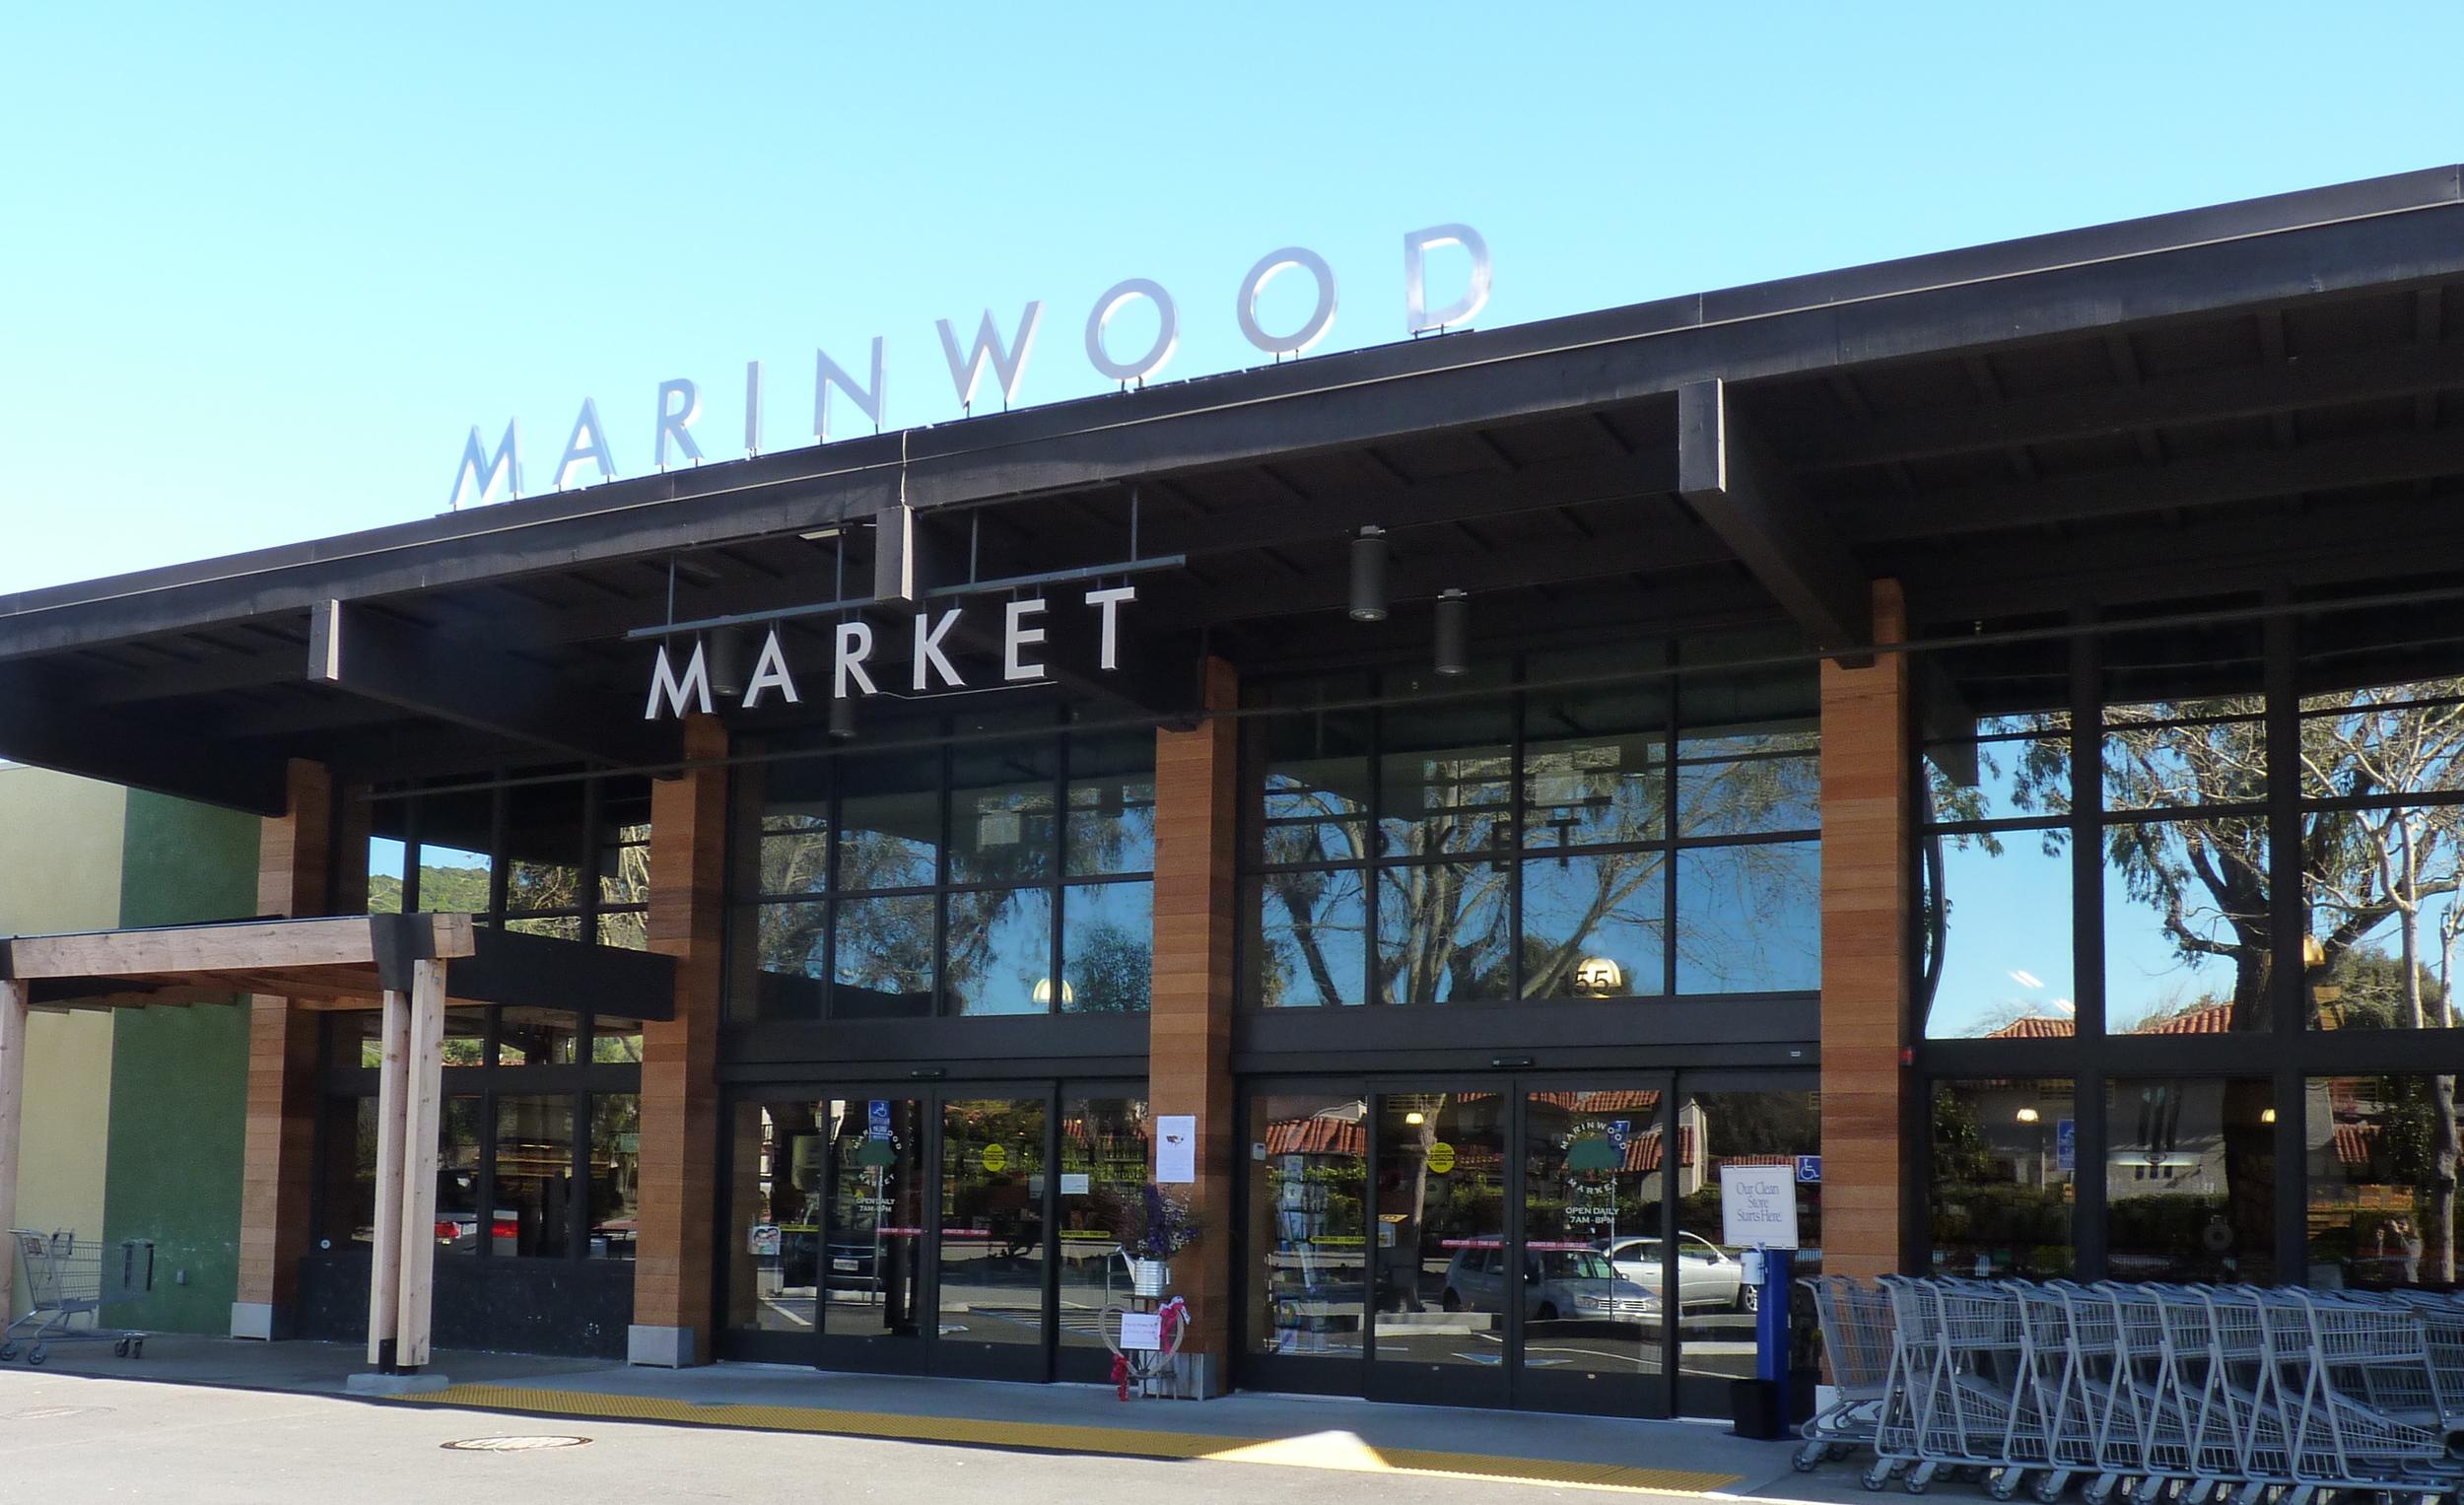 Marinwood Market 1JPG.JPG